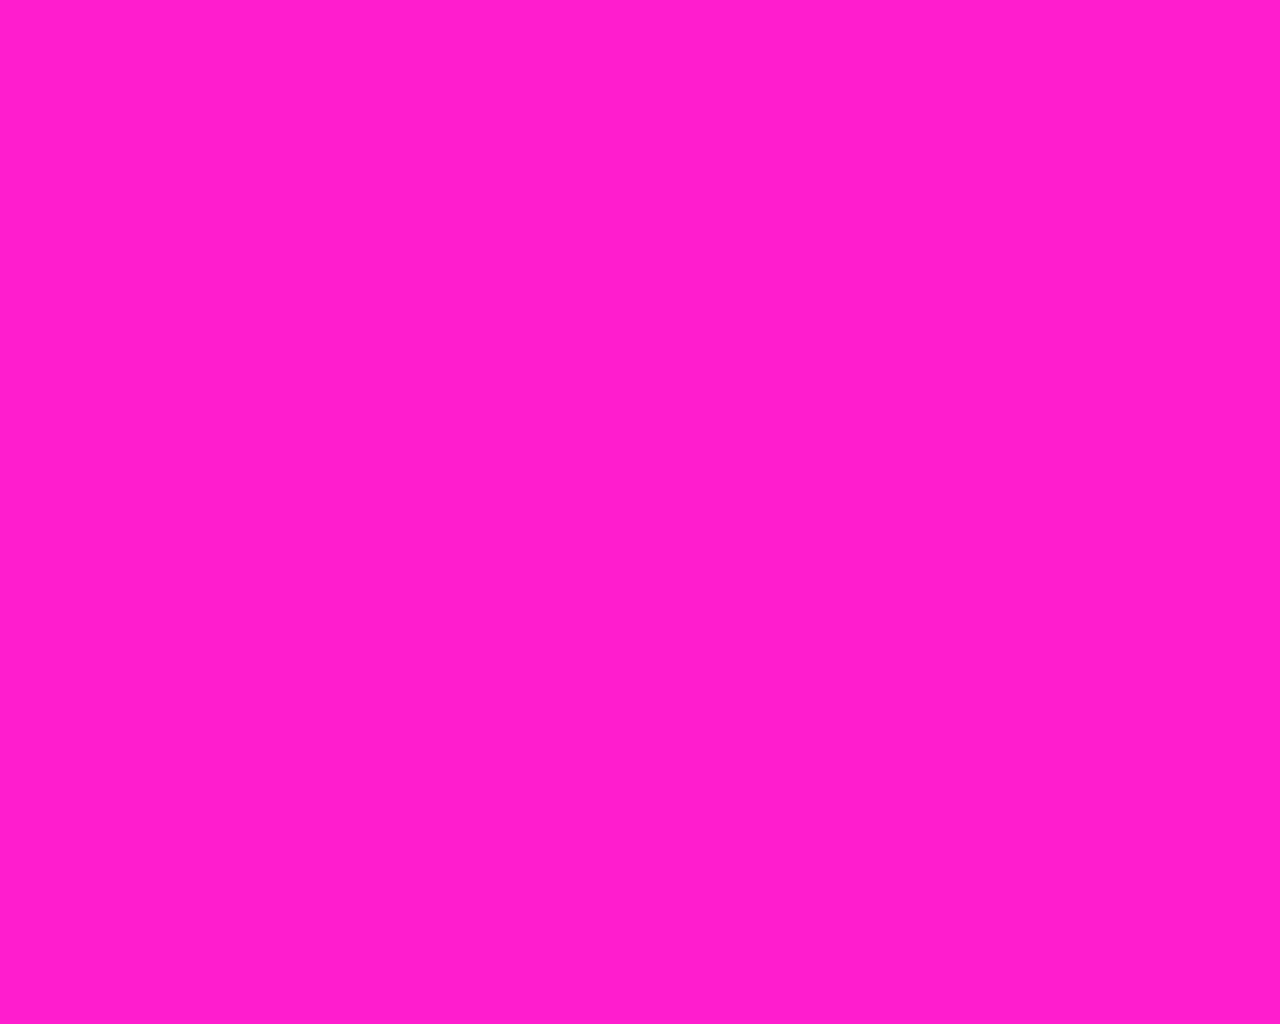 1280x1024 Hot Magenta Solid Color Background